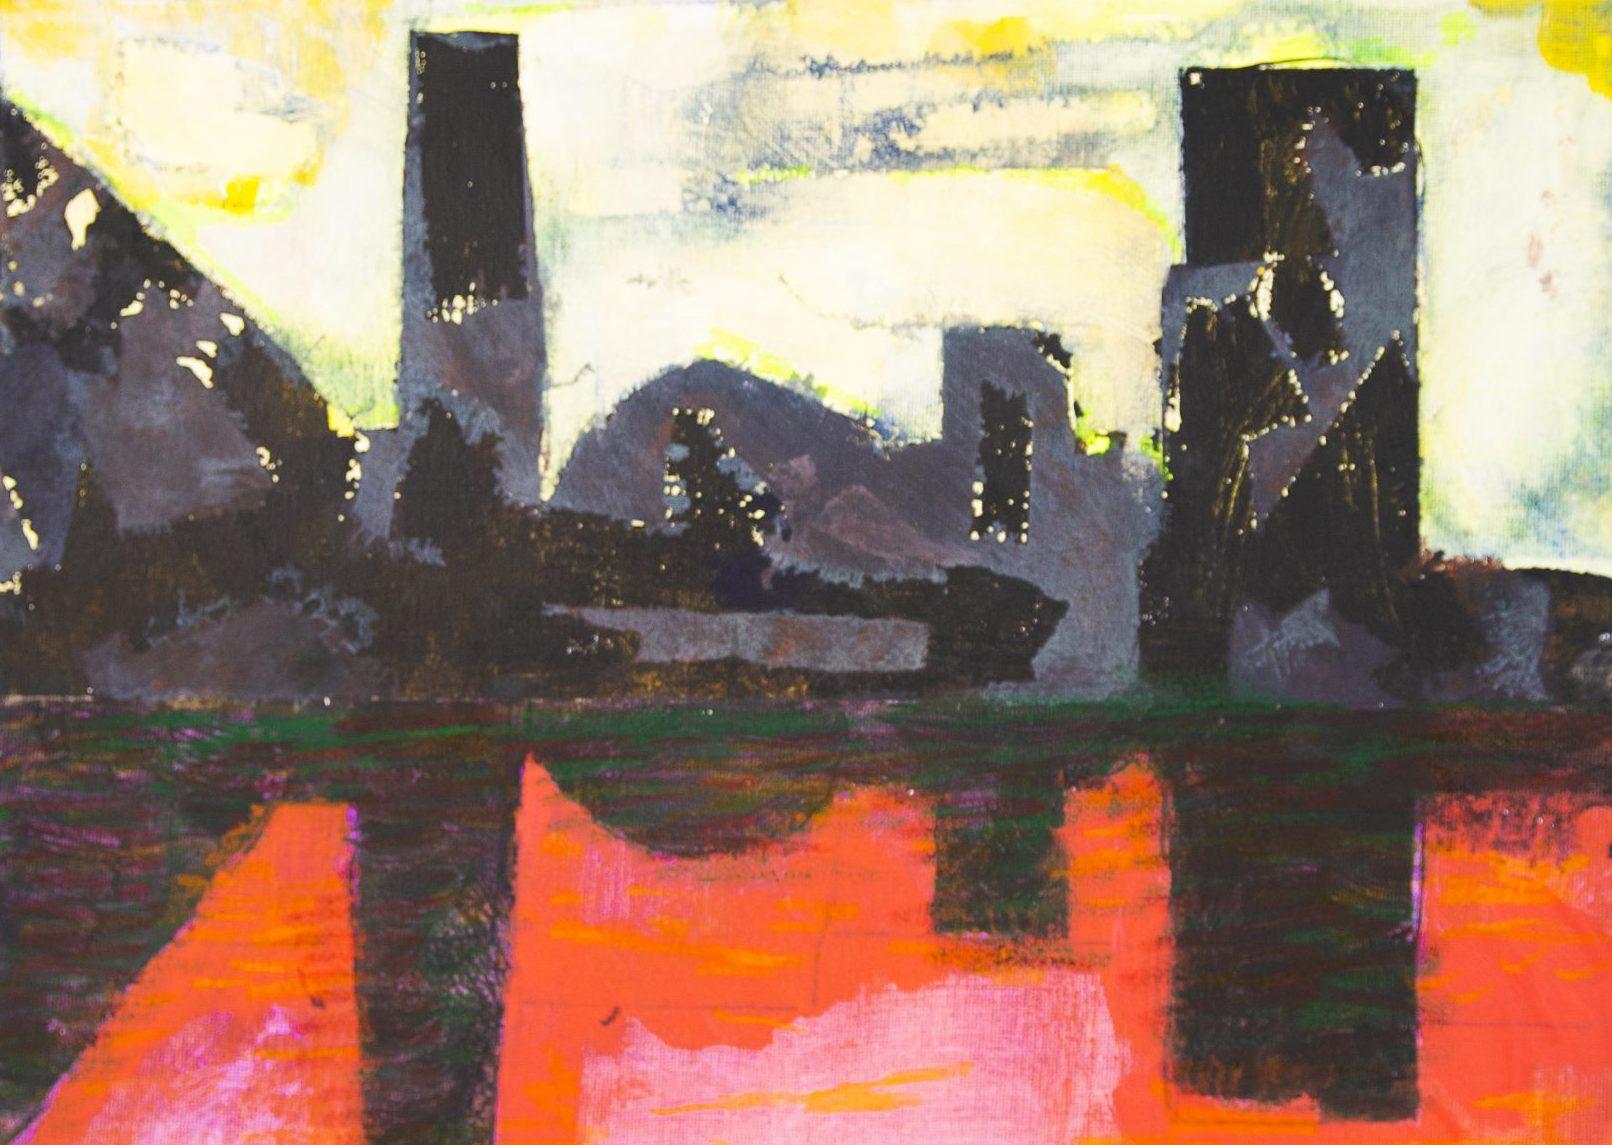 Dark Buildings with Orange Reflected Sky